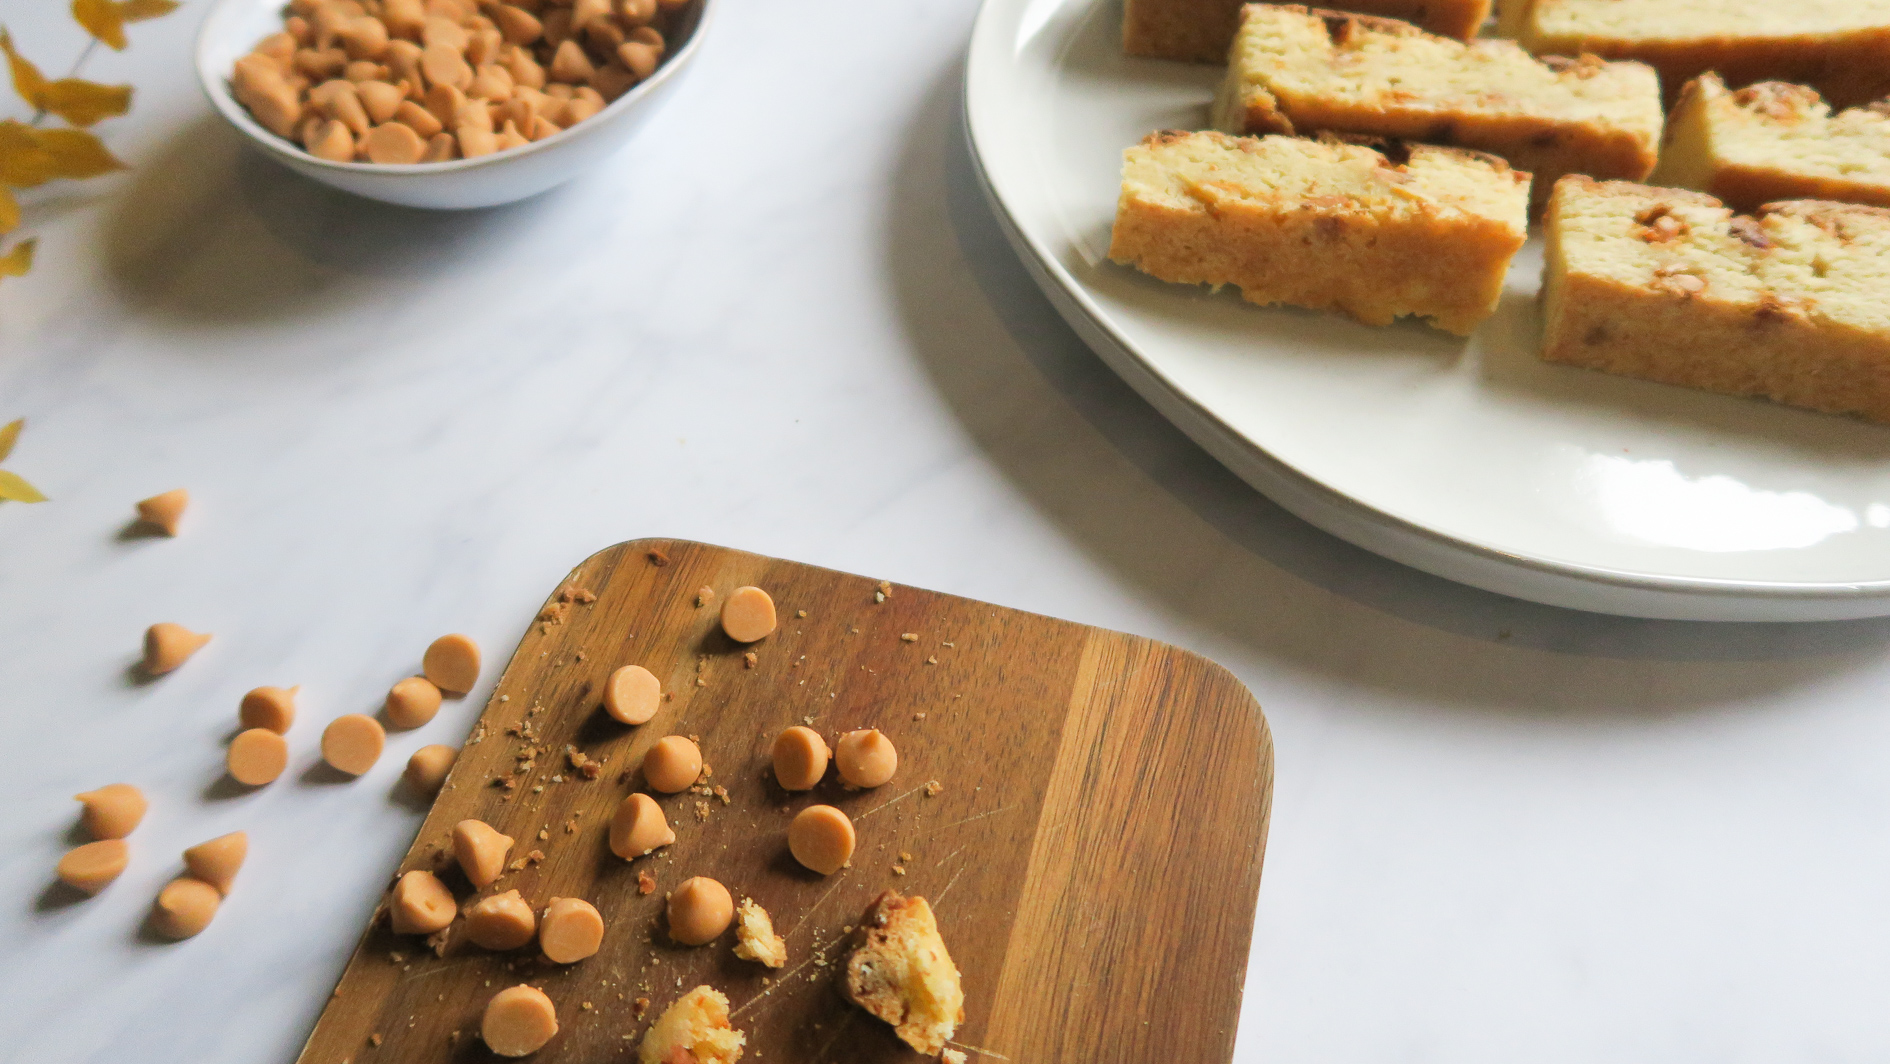 Butterscotch drops on a wooden plate